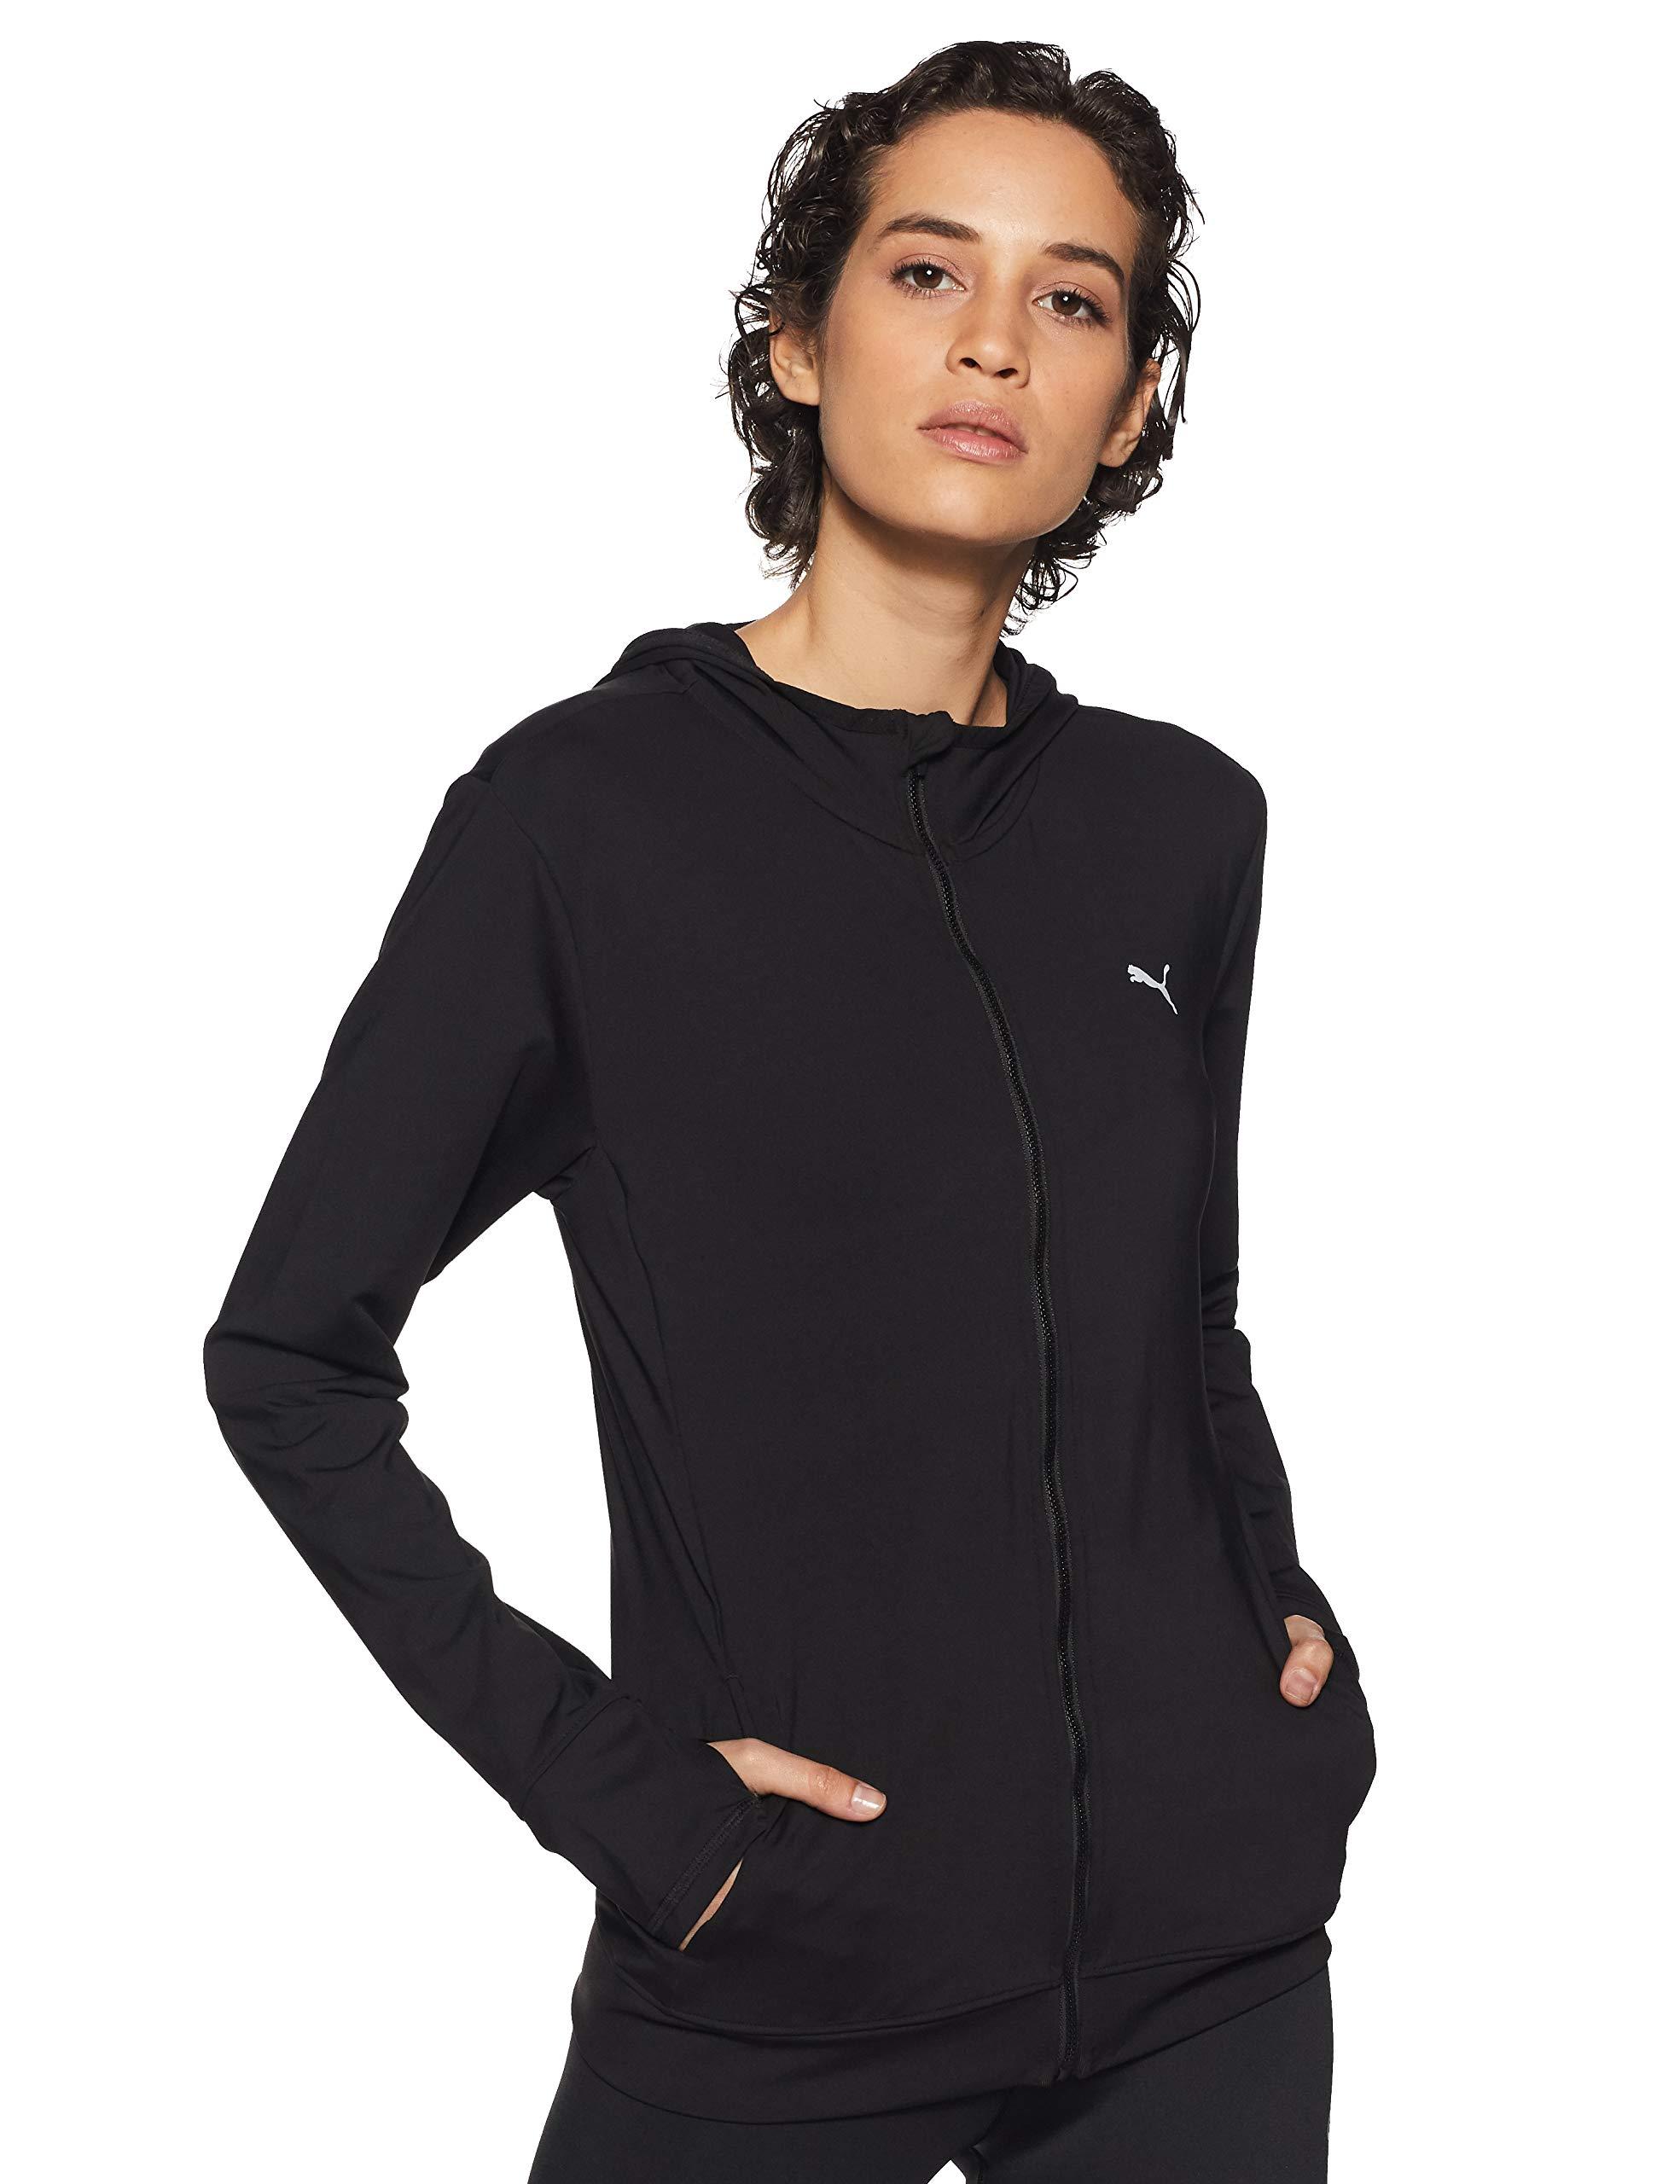 Dettagli su Puma essential jacket felpa donna nero s (Pwj)